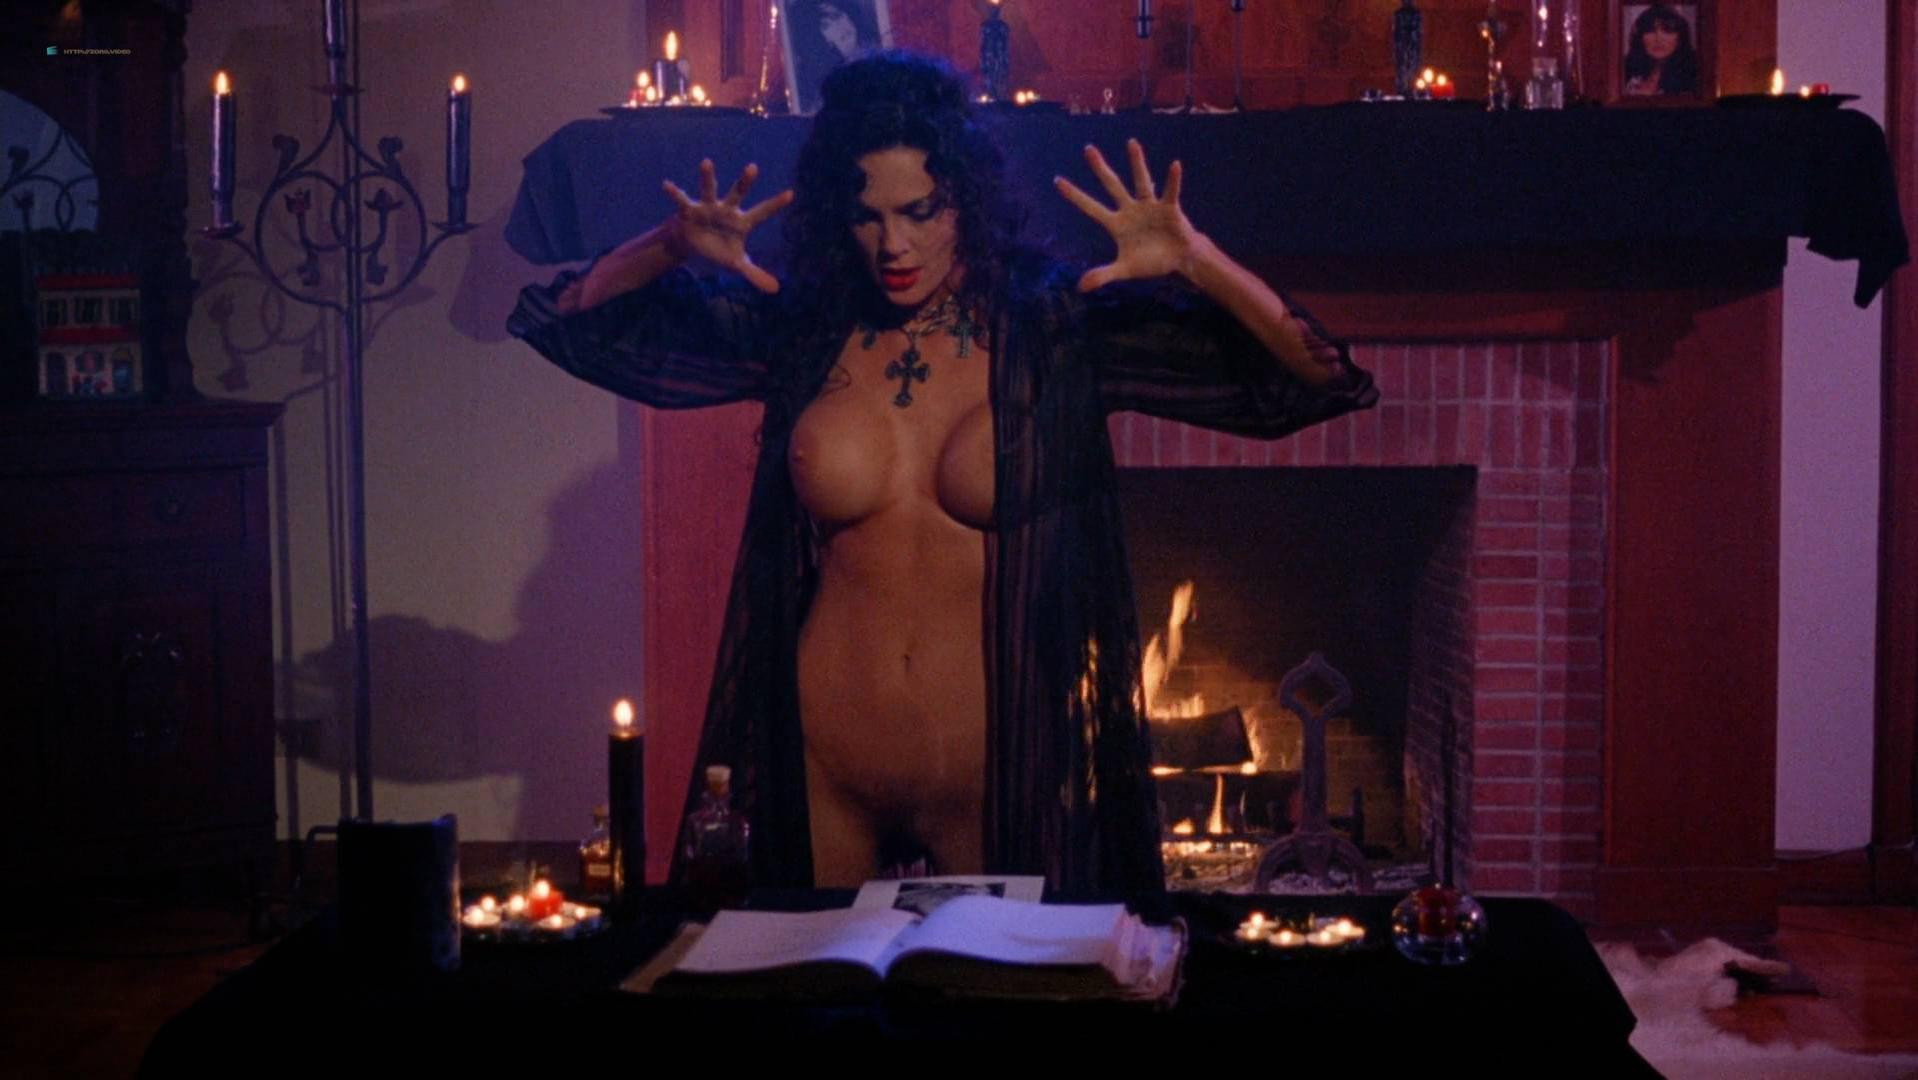 Julie Strain nude, Rochelle Swanson nude, Kristi Ducati nude - Sorceress (1994)